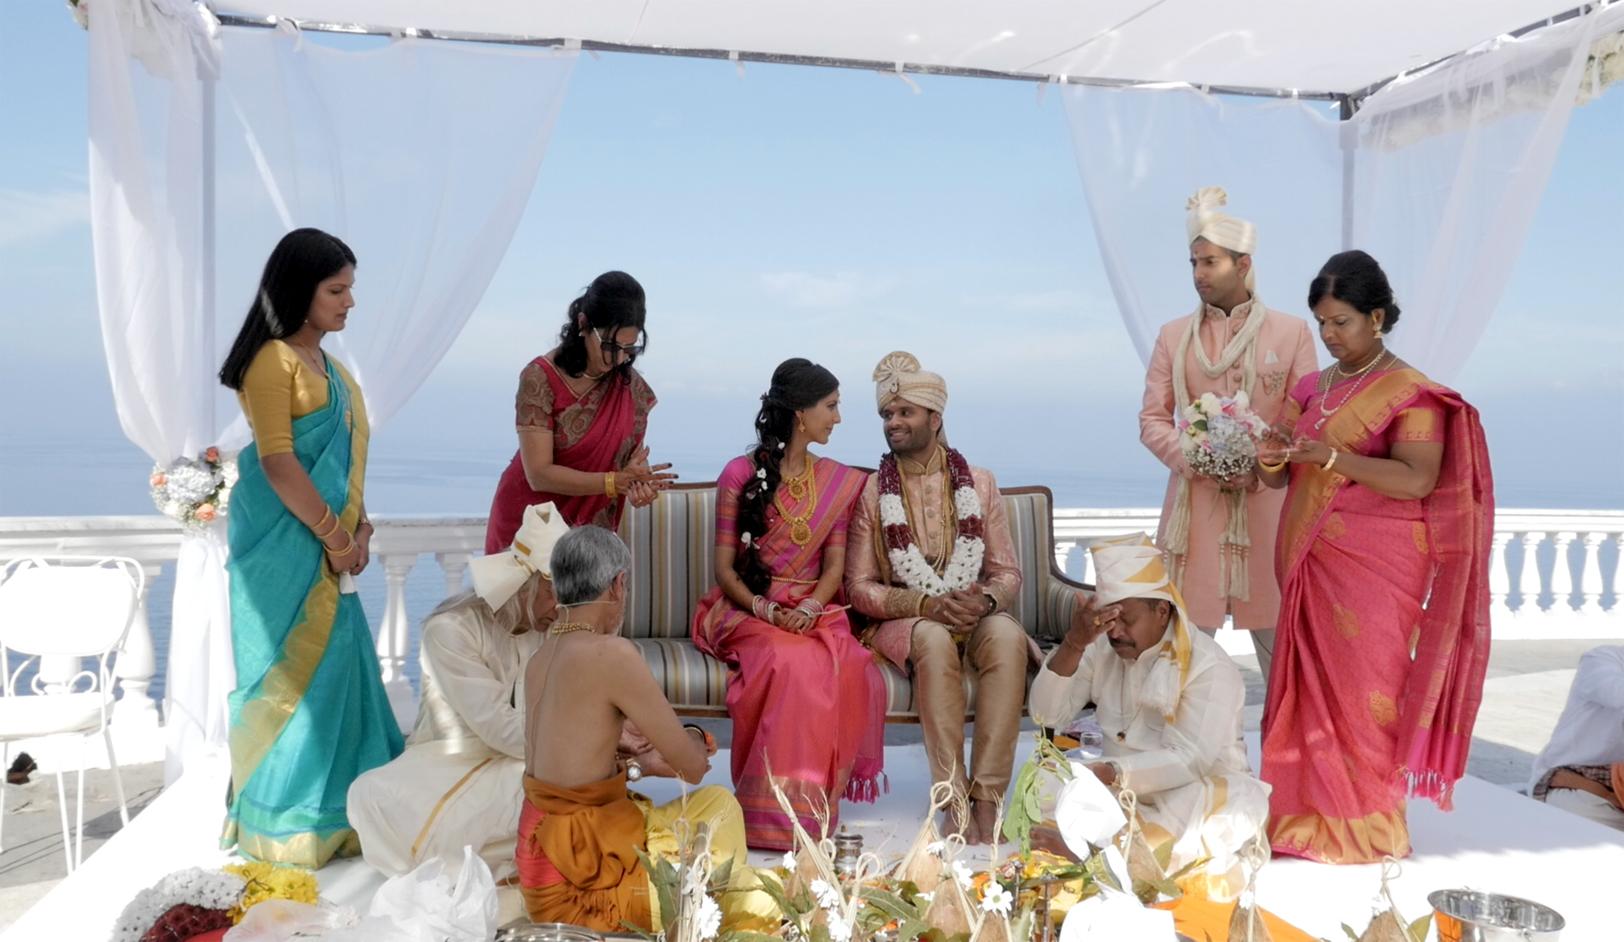 matrimonio-indiano-amalfi-hotel-cocumella-sorrento.jpg